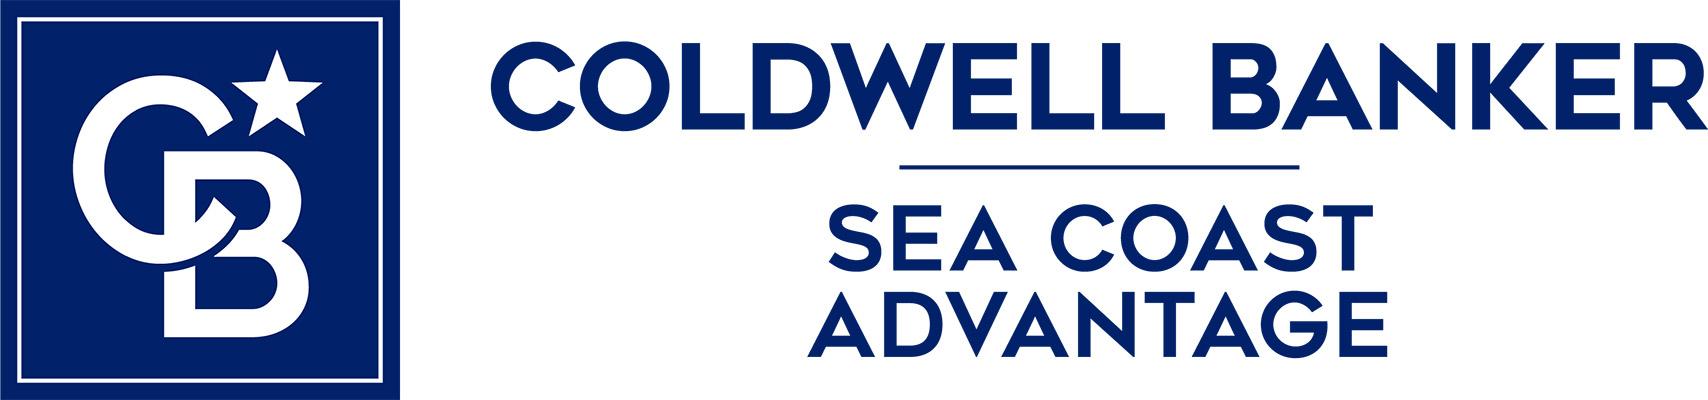 Surf & Turf Properties - Coldwell Banker Sea Coast Advantage Logo